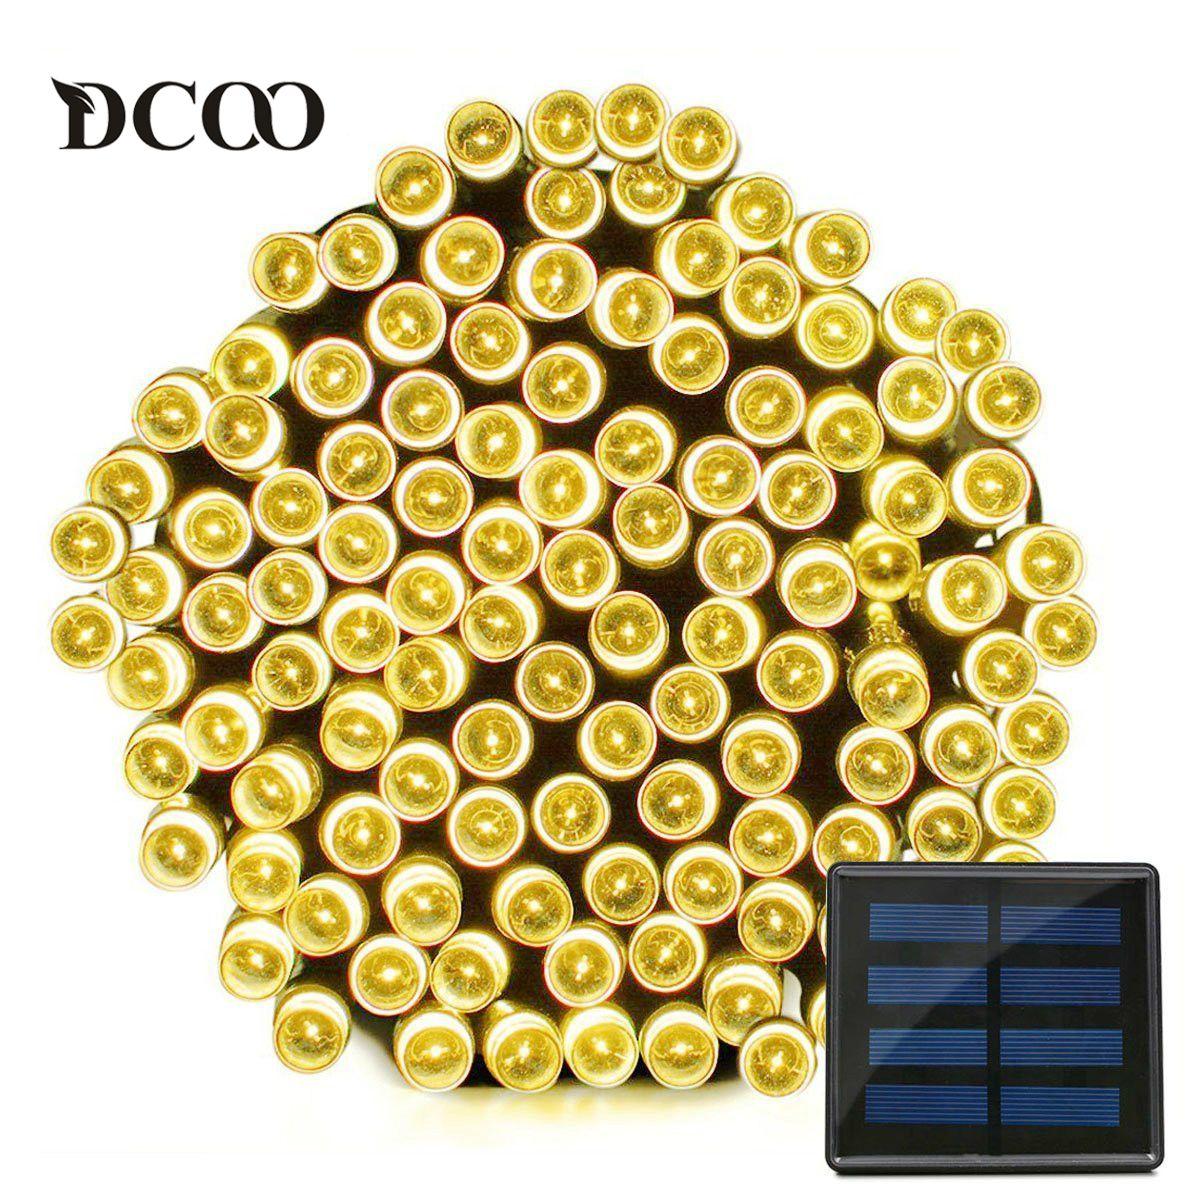 Dcoo Solar LED String Lights 22meter 200 LEDs Waterproof 8 Modes <font><b>Fairy</b></font> Christmas Lights Outdoor Lighitng Garden Party Lights